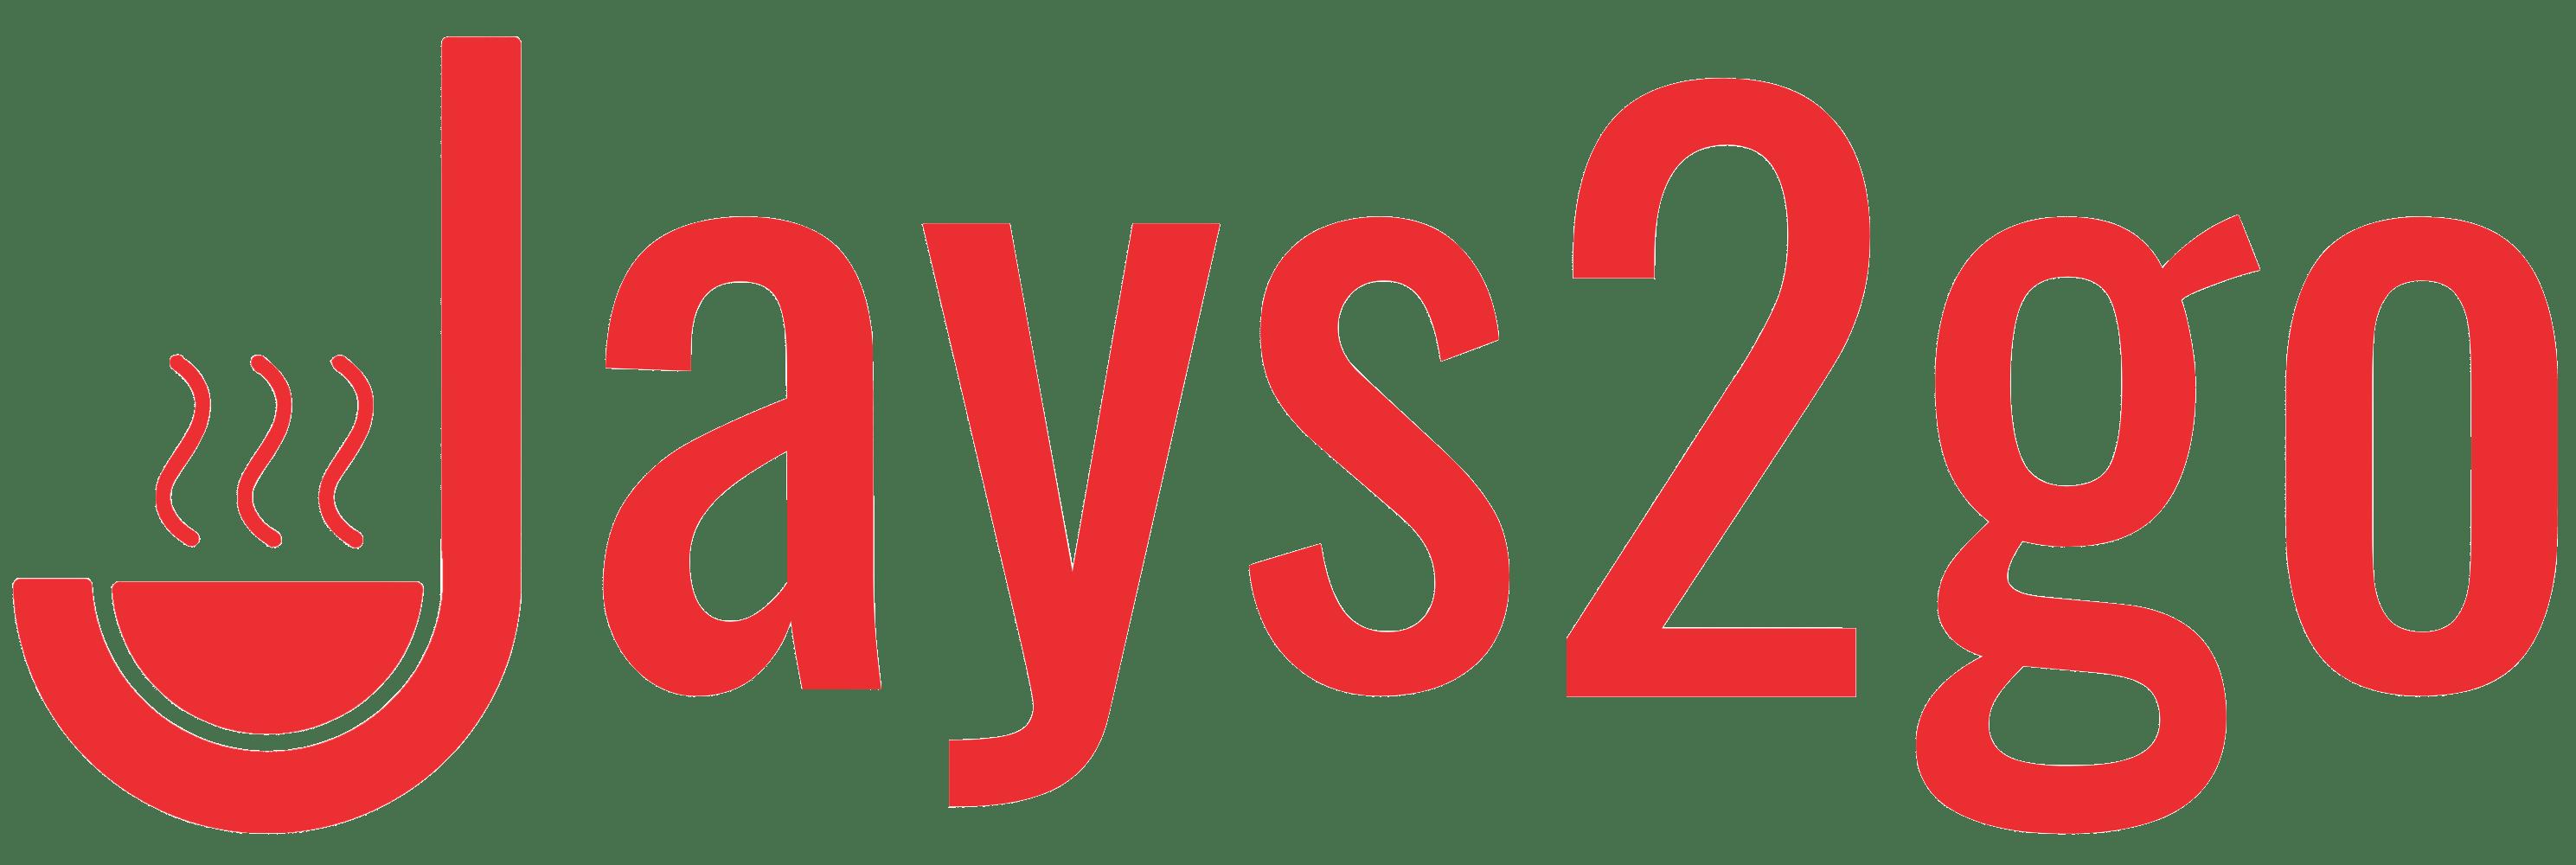 Jay's 2 Go